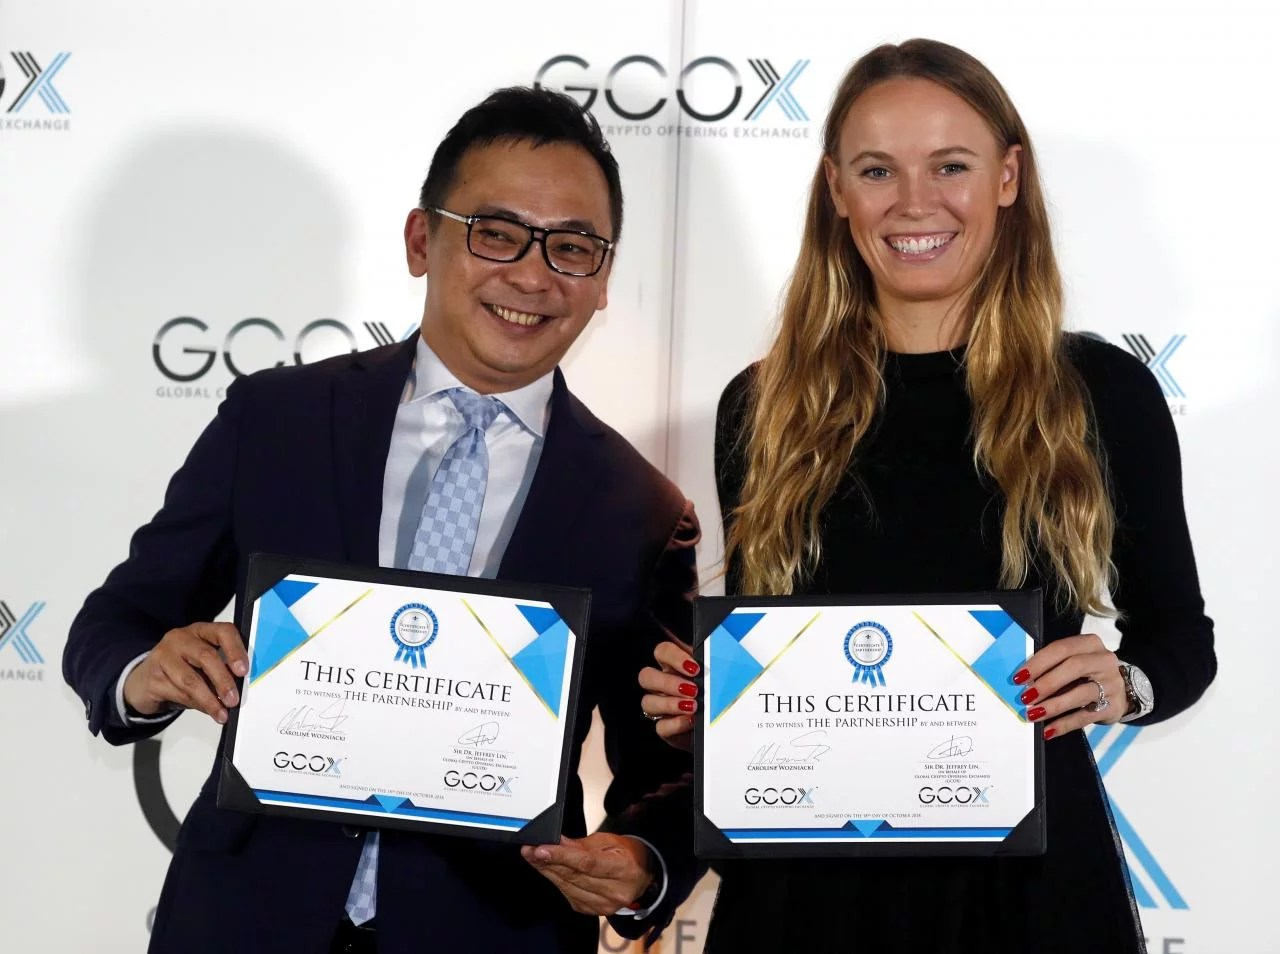 Caroline Wozniacki, tenista número dos del mundo, tendrá su propio token digital